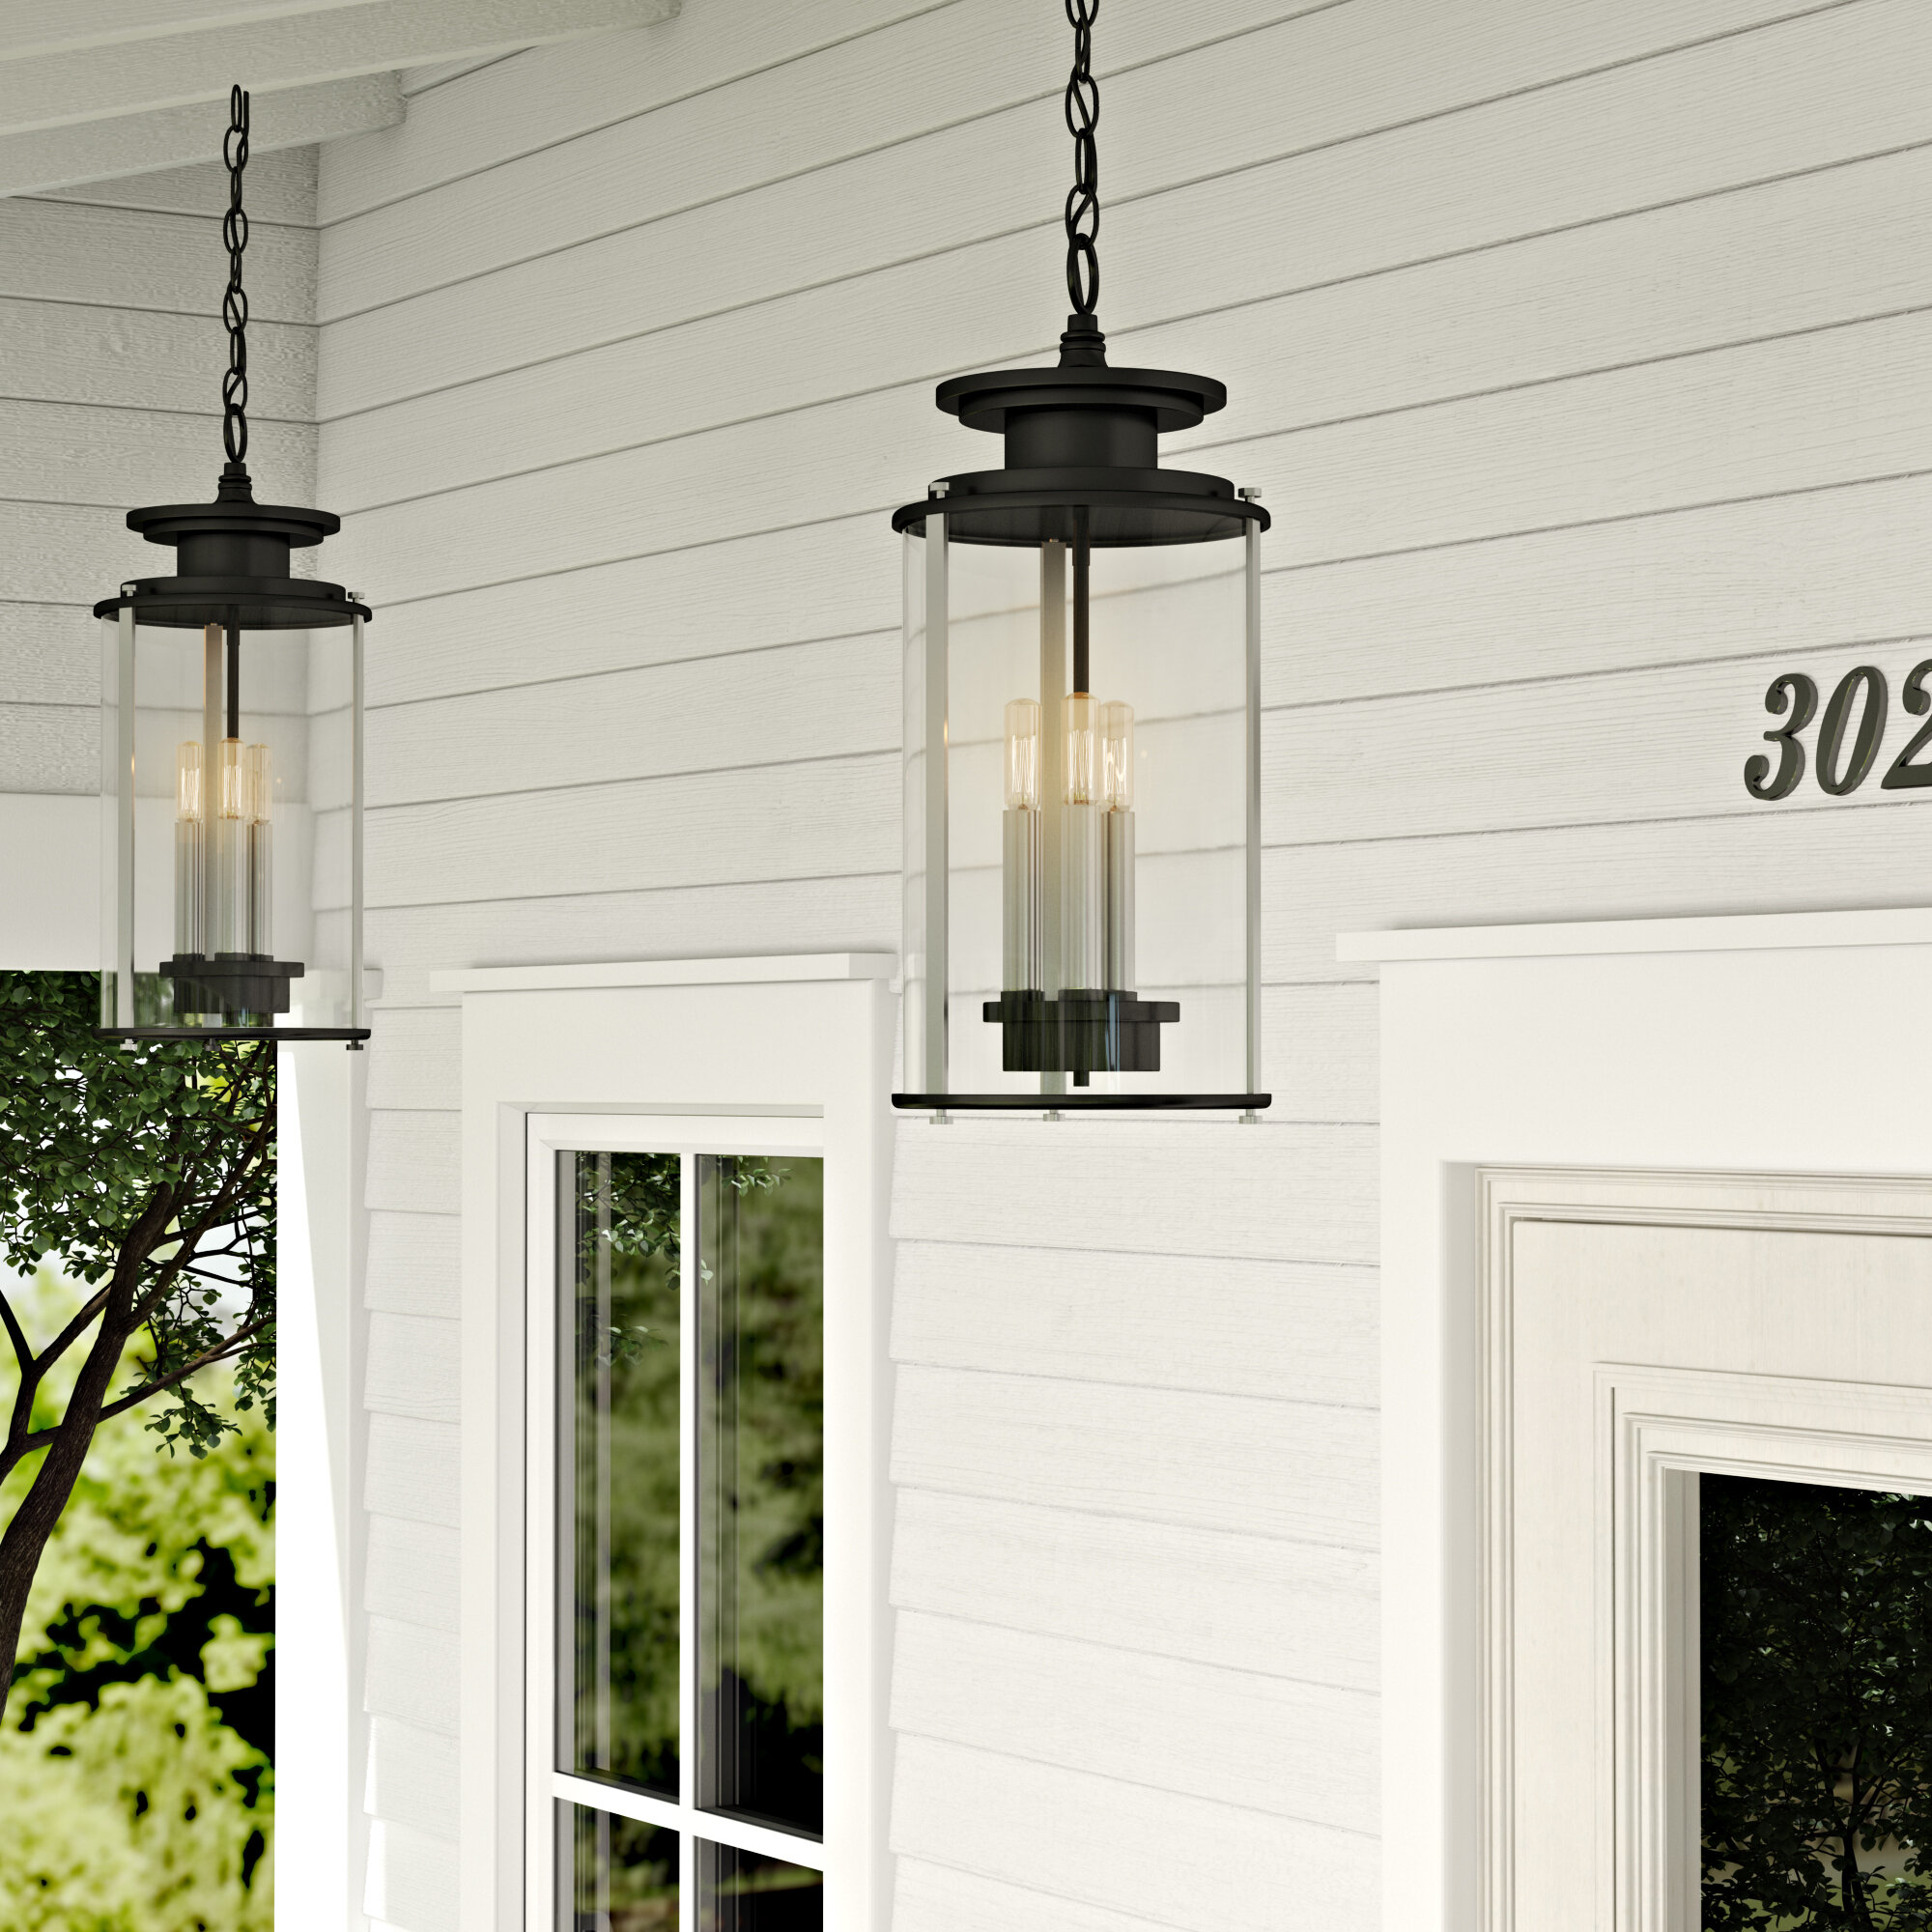 17 stories evgenia 3 light outdoor hanging lantern reviews wayfair